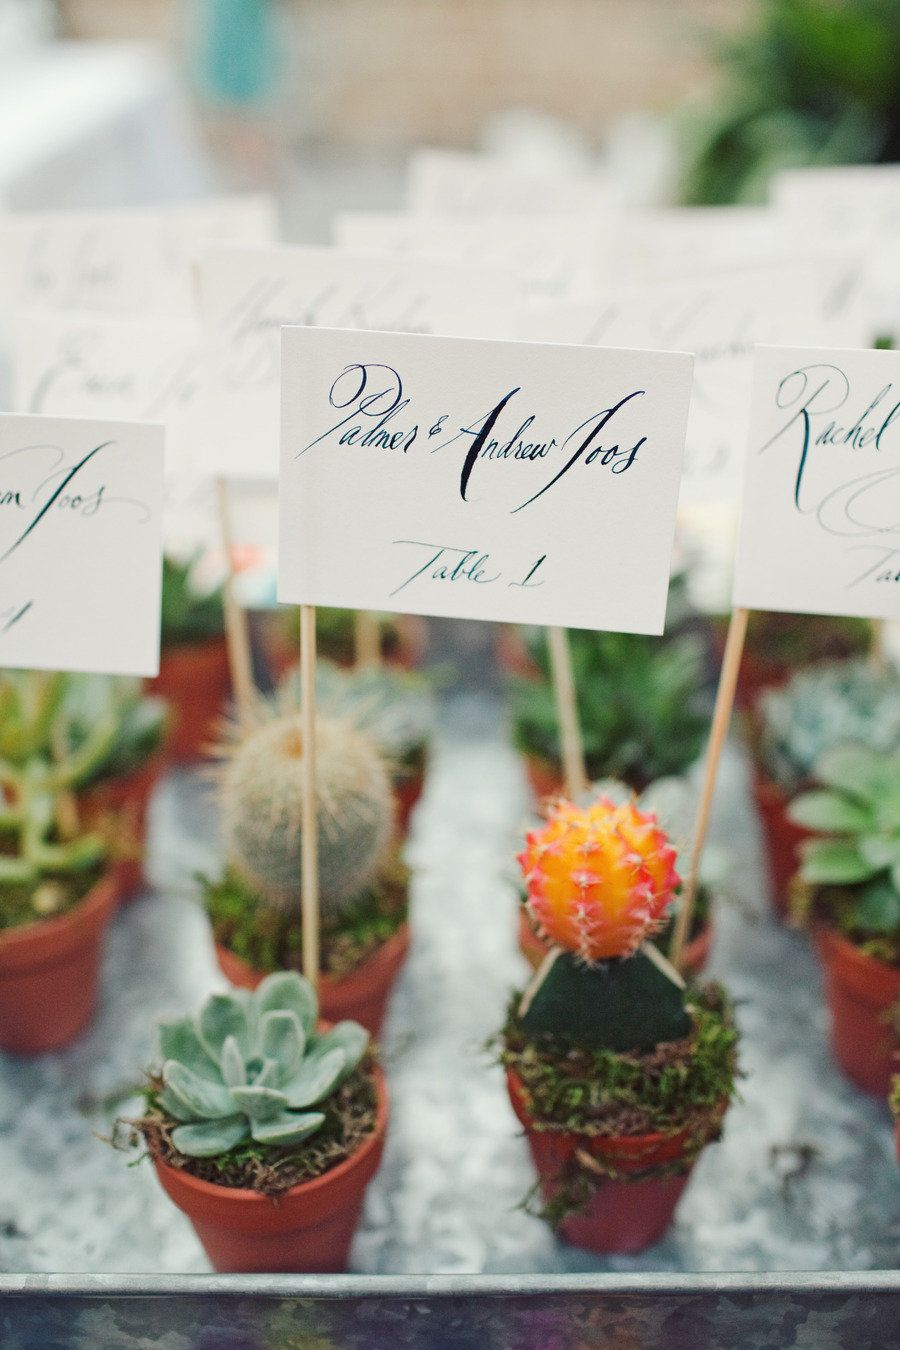 Austin Wedding from The Nichols | Succulent favors, Floral designs ...